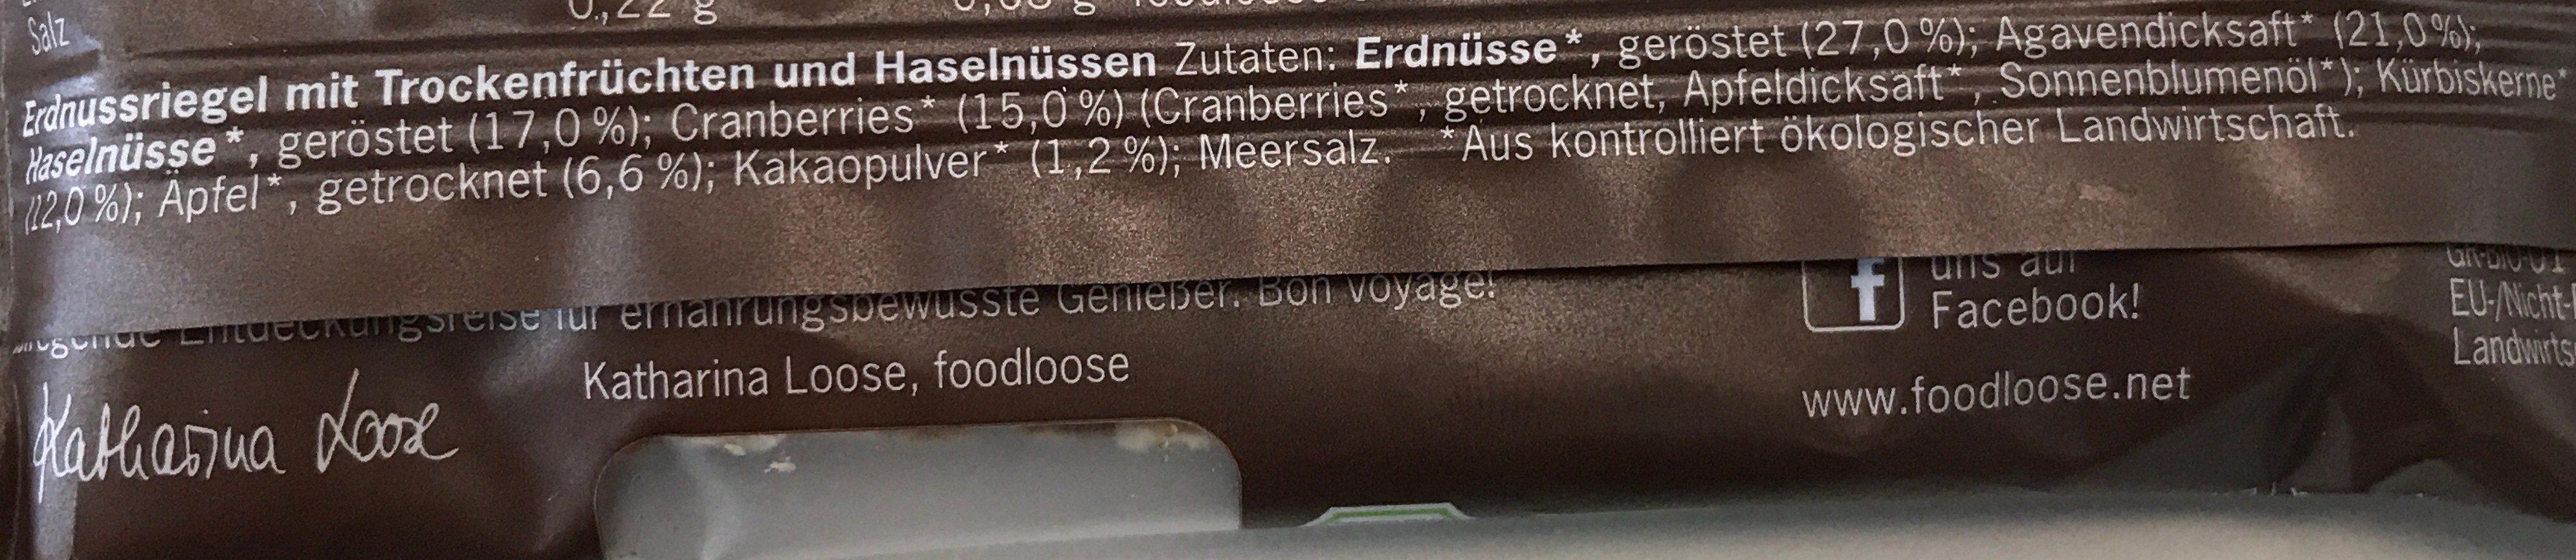 Frisco Crisp Bio-Nussriegel - Ingrédients - fr